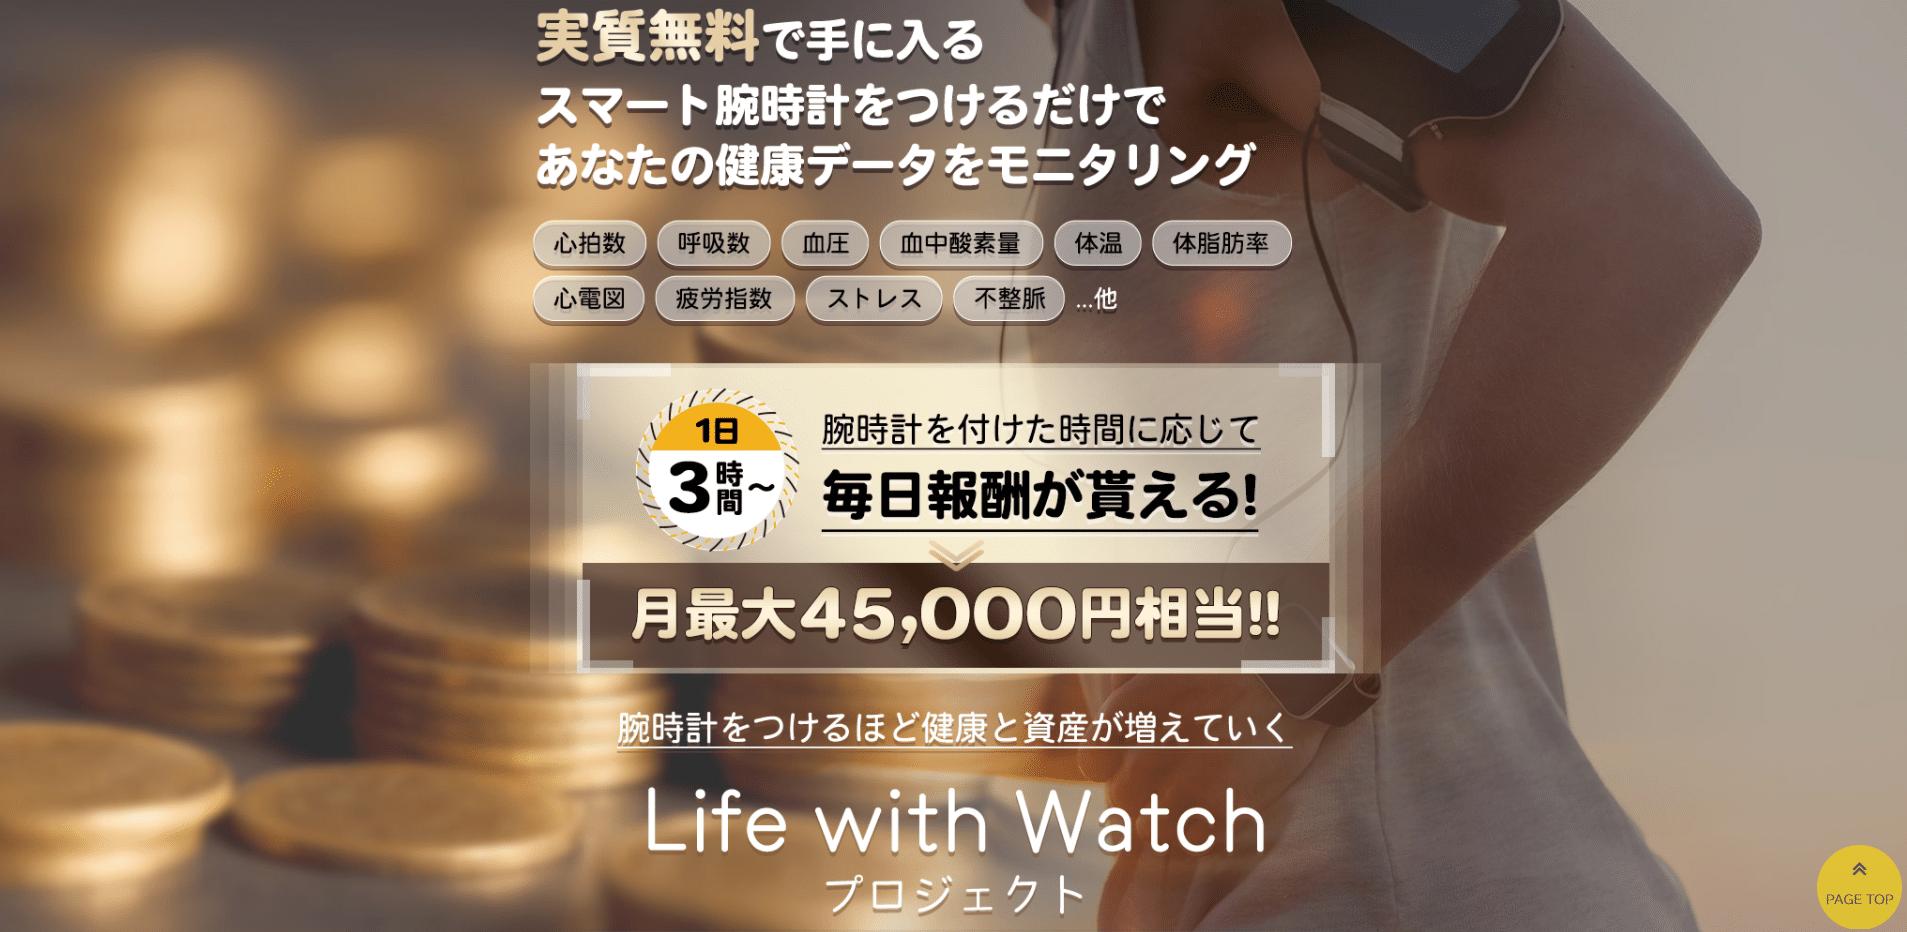 Life with Watchプロジェクト 無料モニターは詐欺?